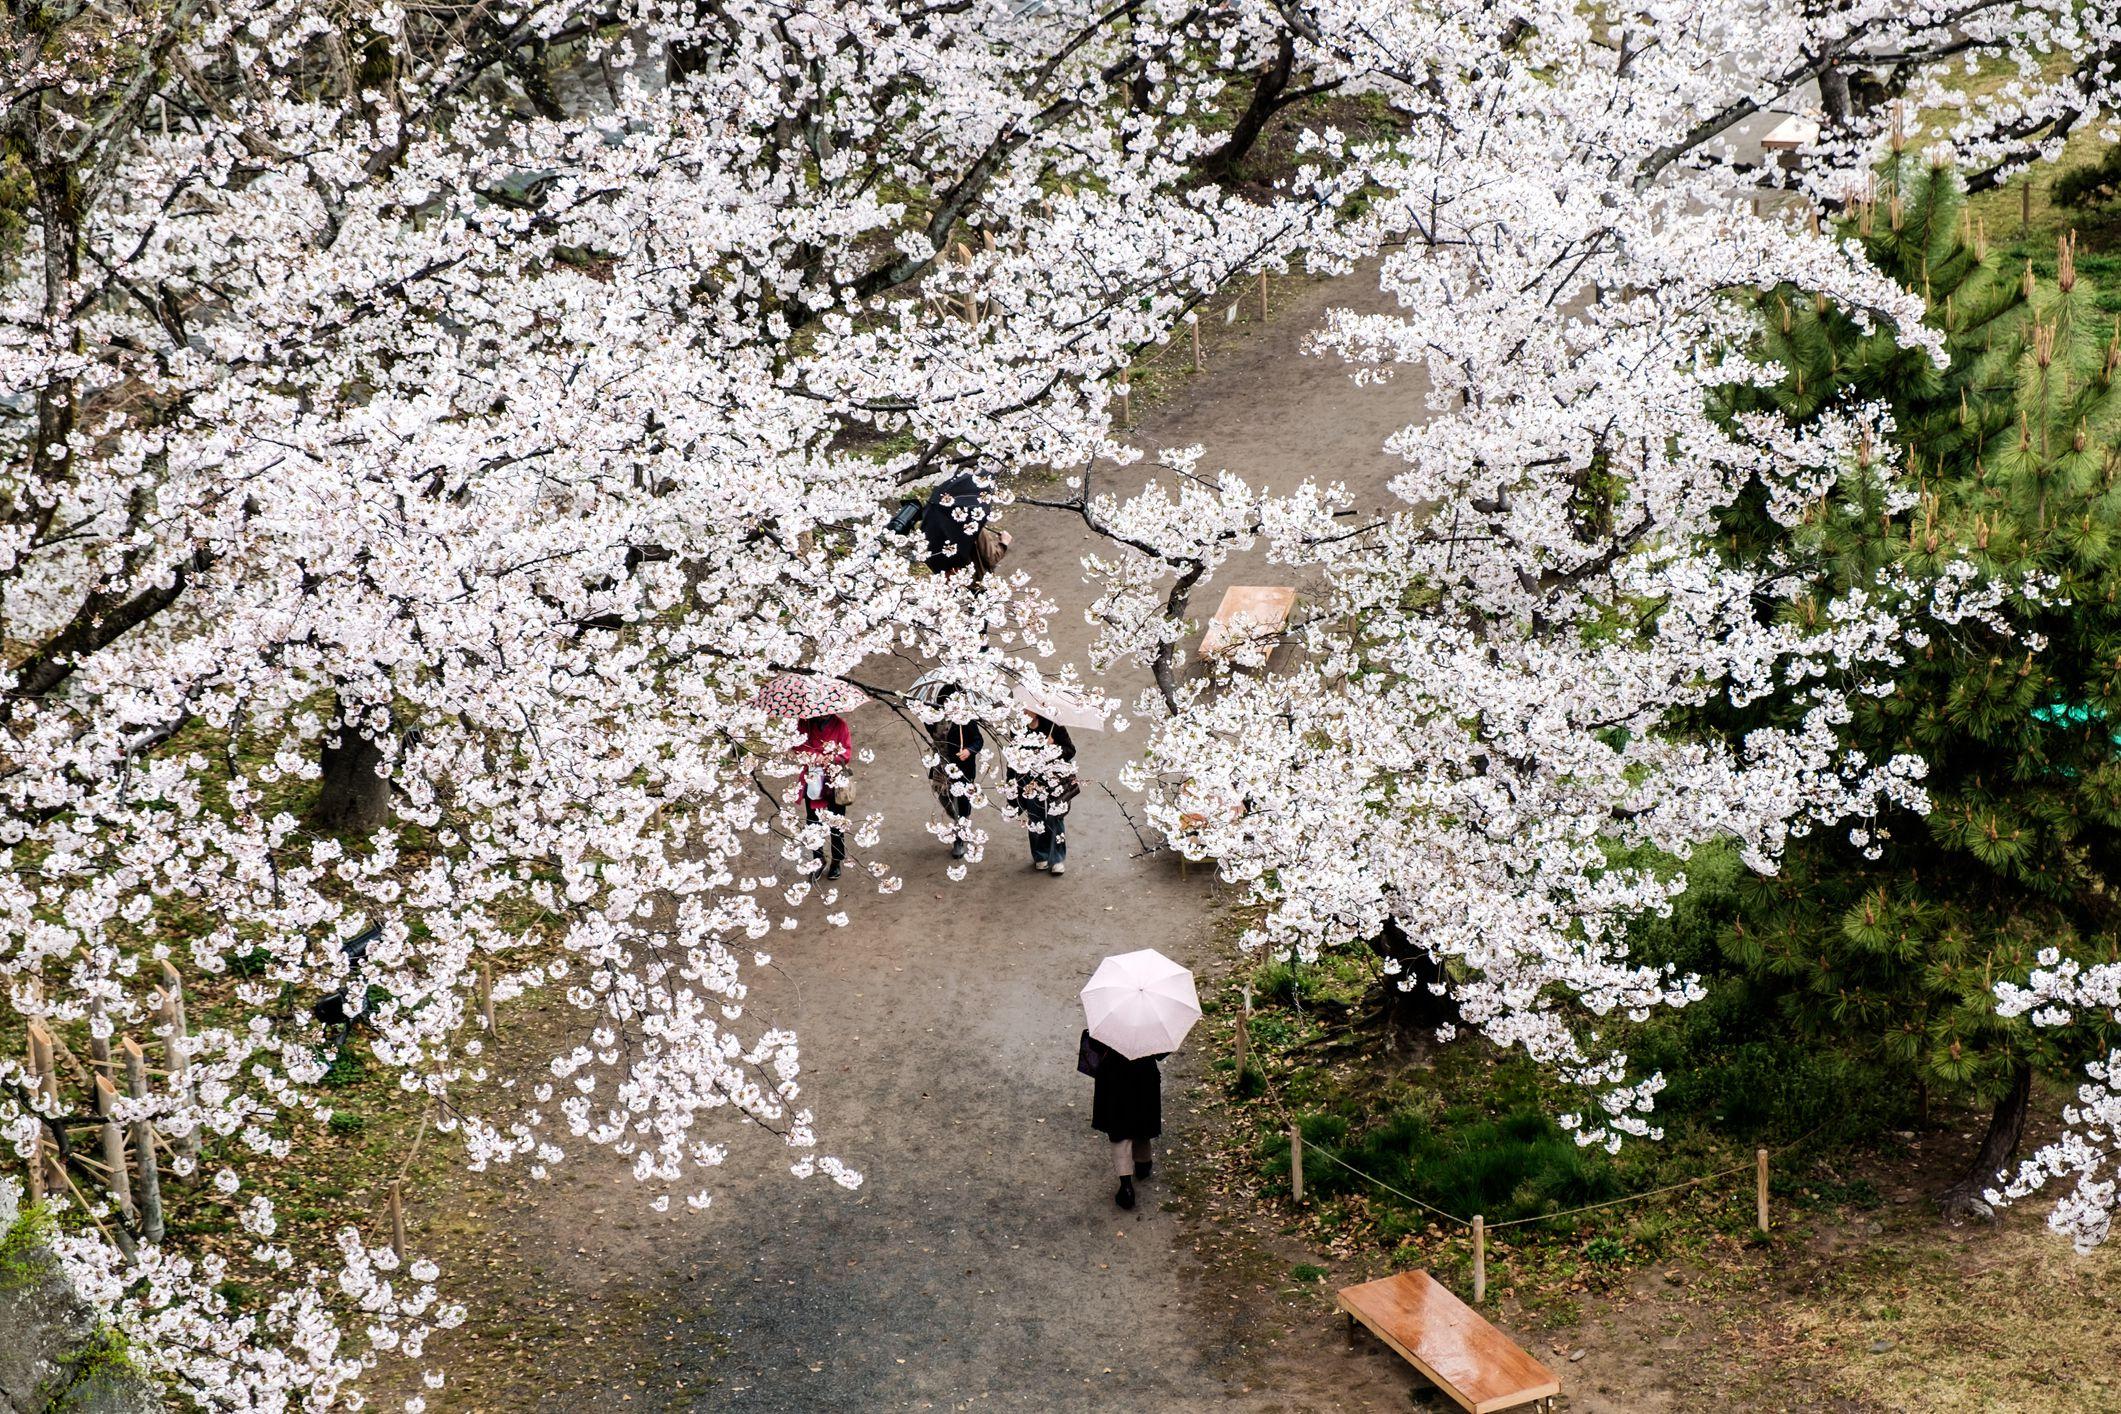 Person Holding Umbrella under Canopy of Cherry Blossom